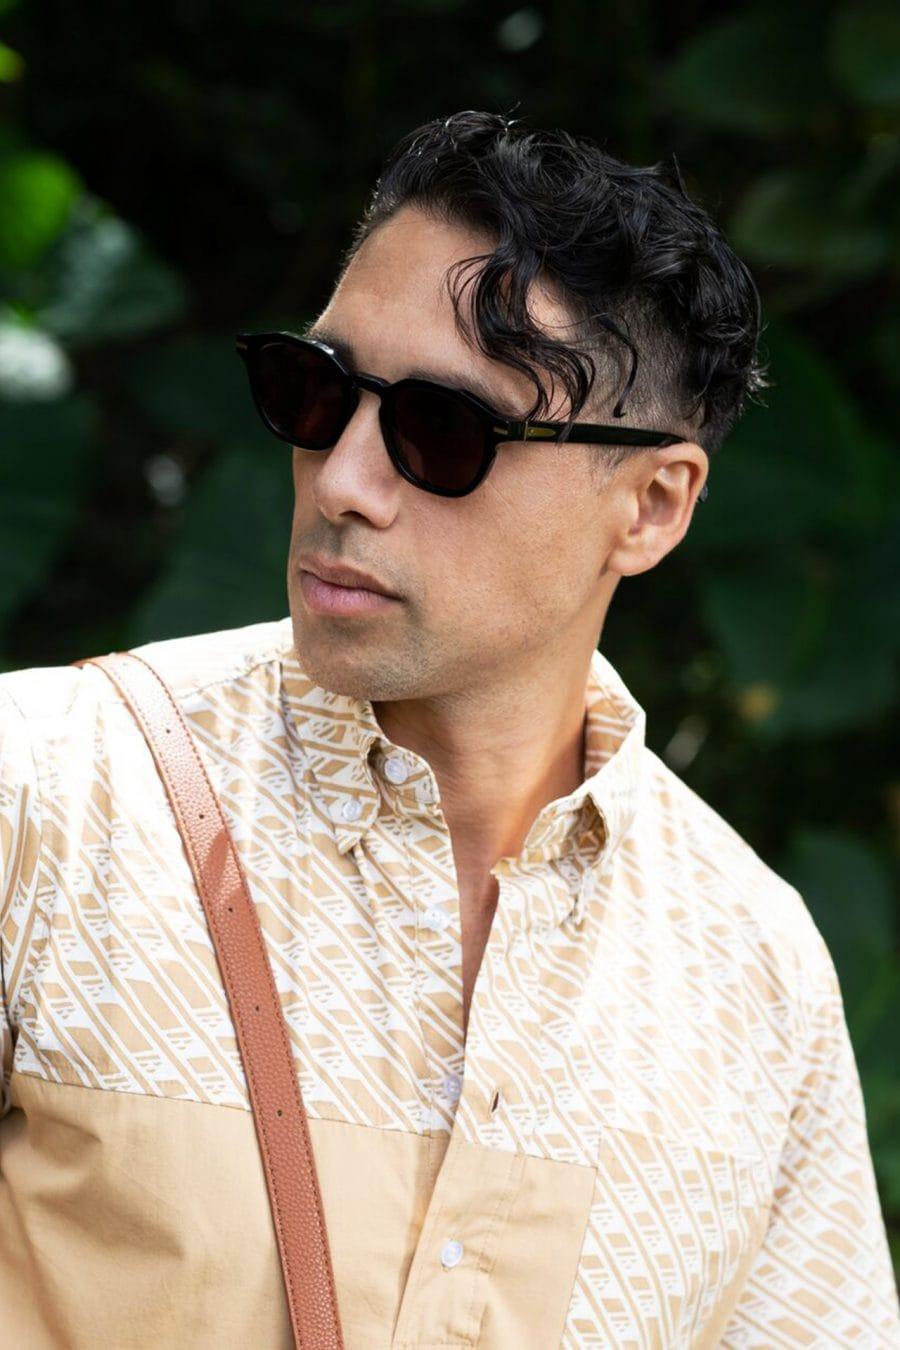 Male model wearing Hegias Black Sunglasses